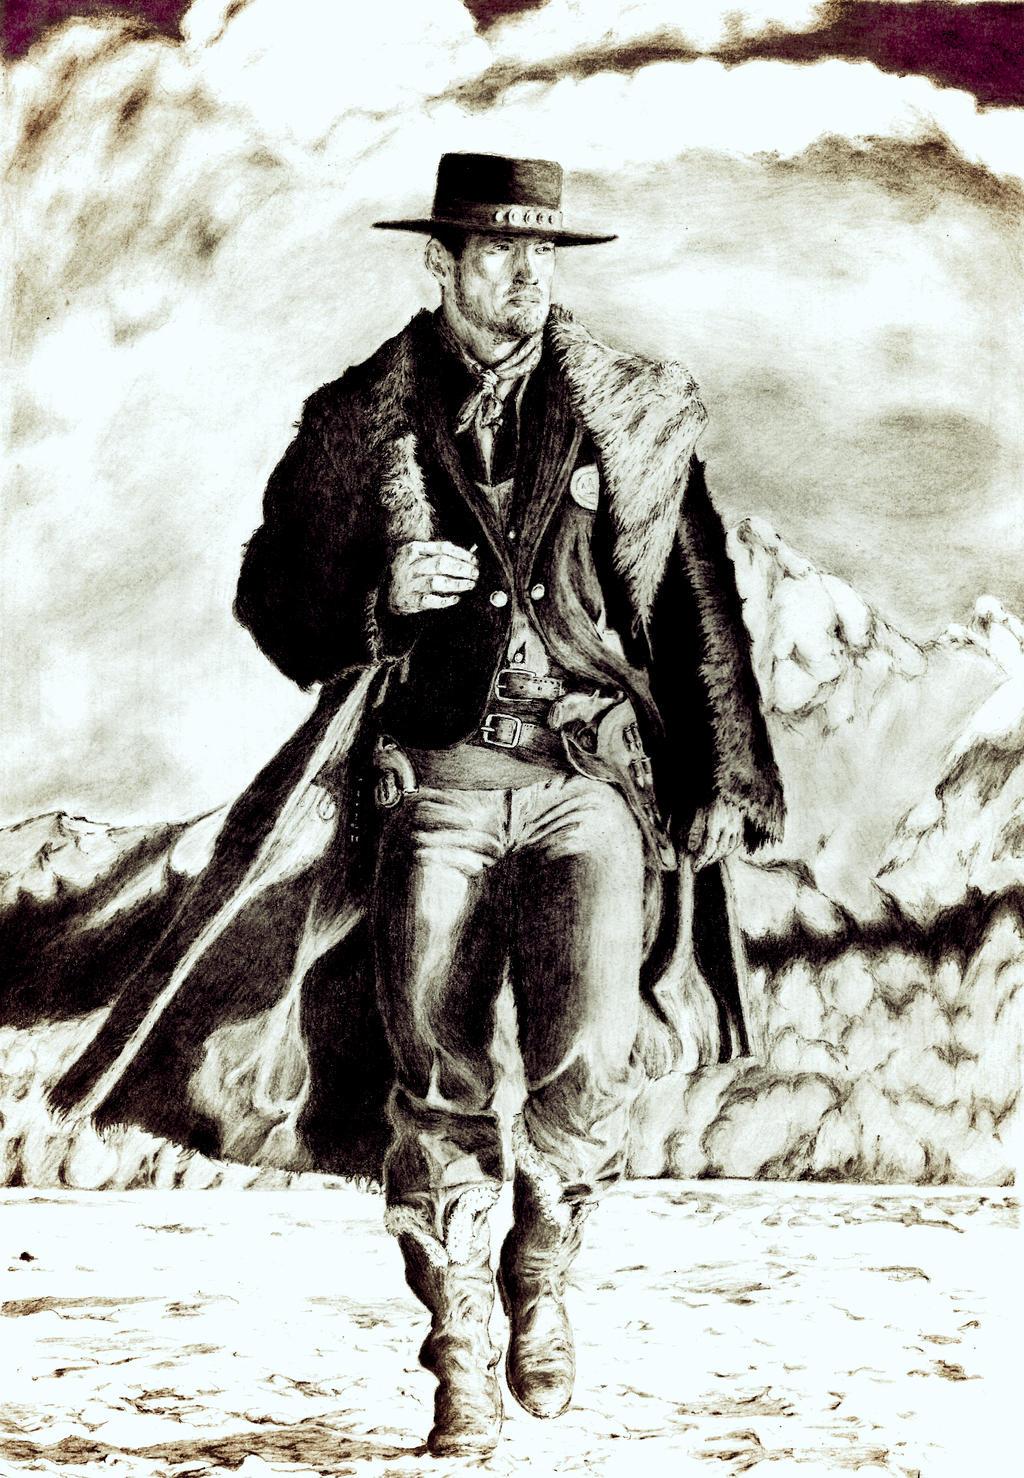 Wild West by FINIST888